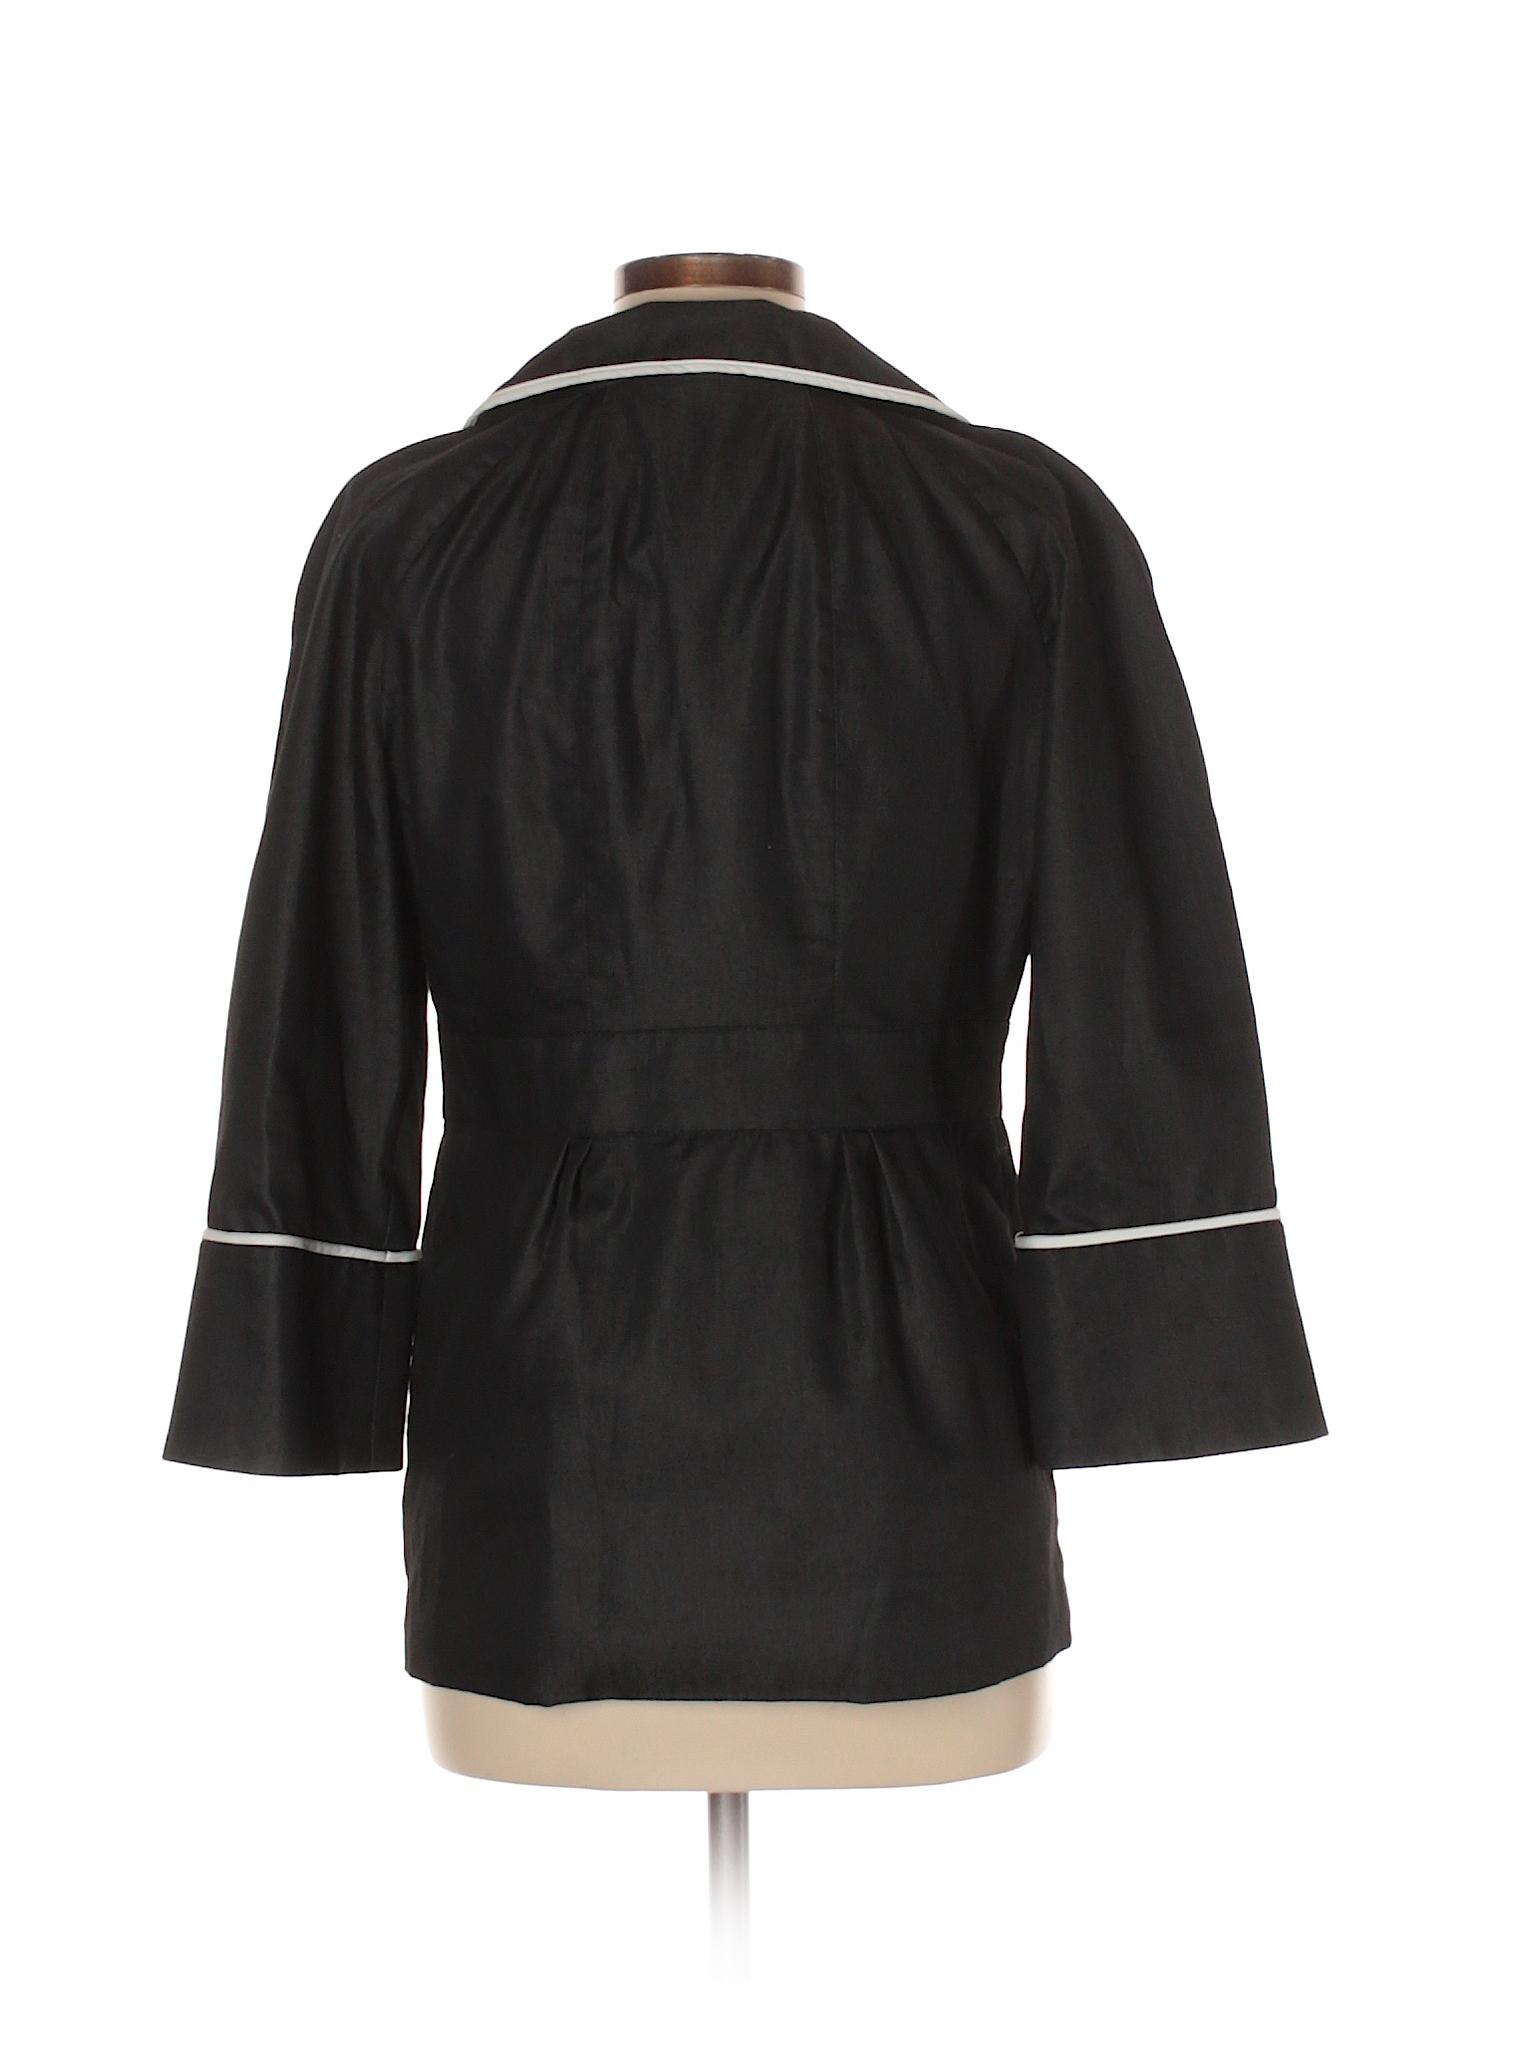 Jacket leisure Boutique leisure Boutique Kenar 1Y1ZI